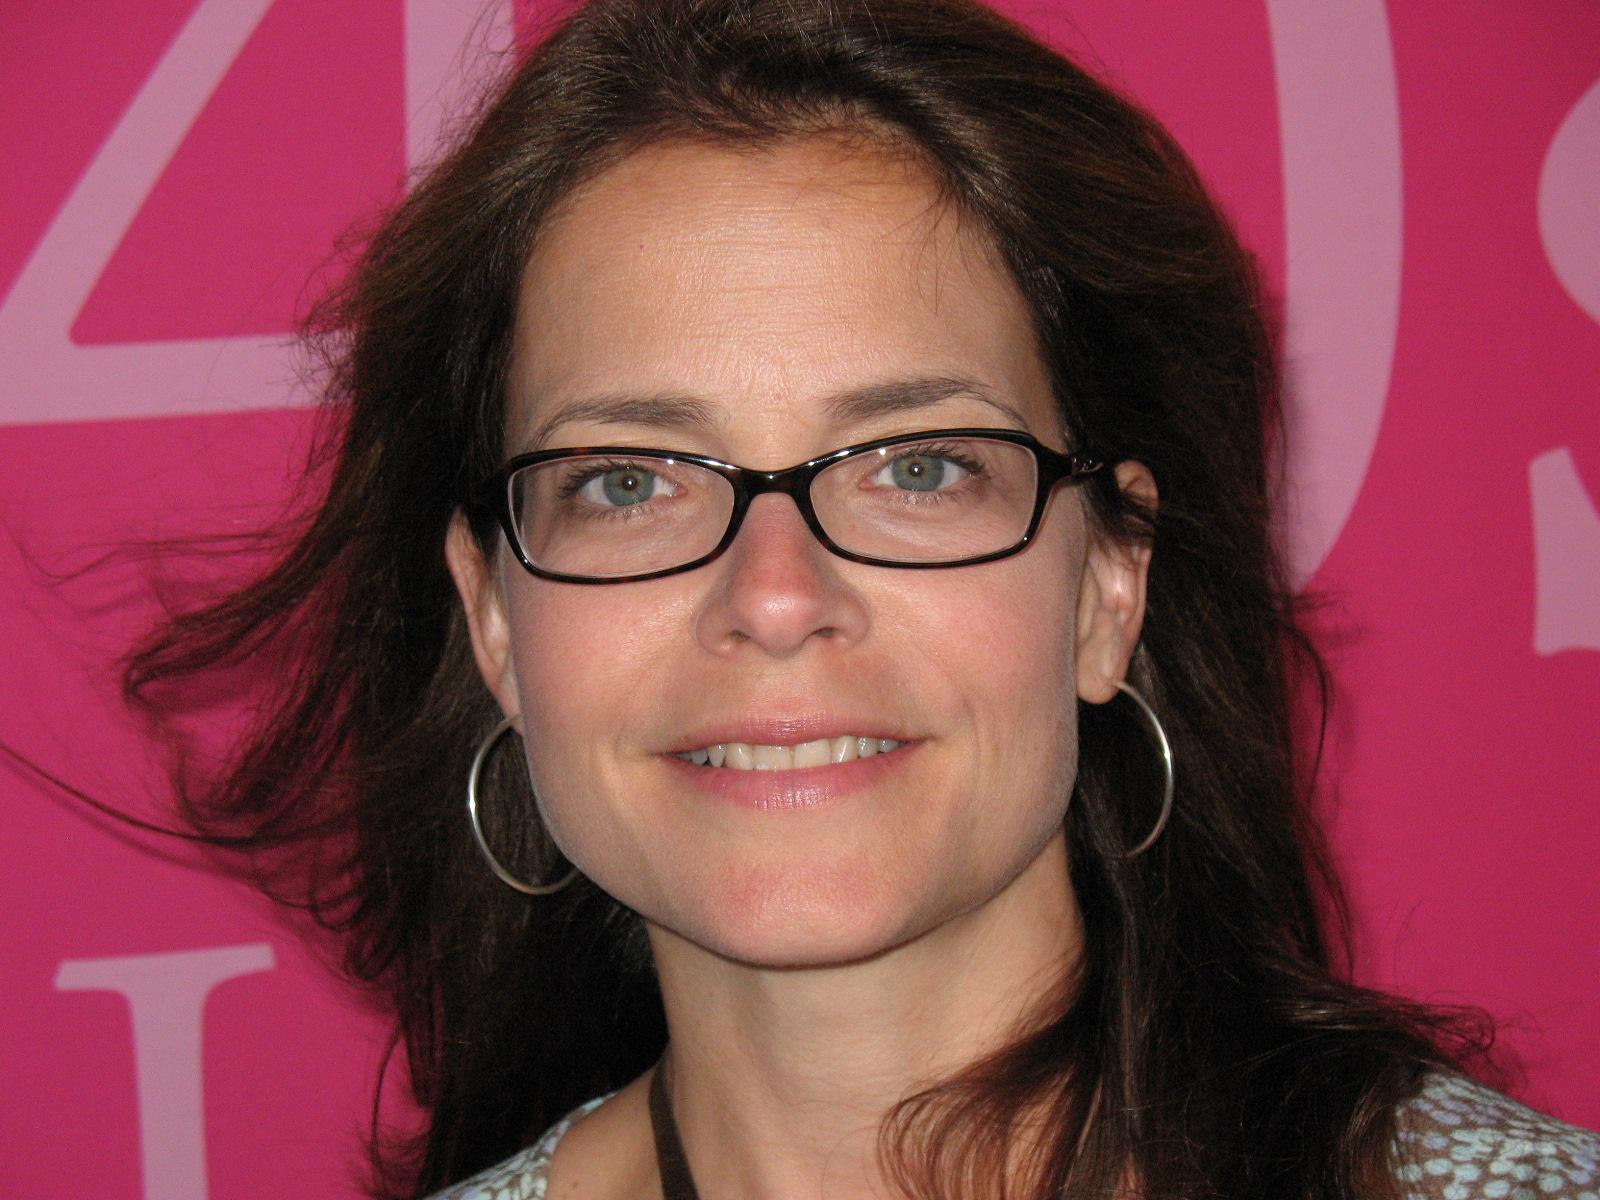 Esther Gulli